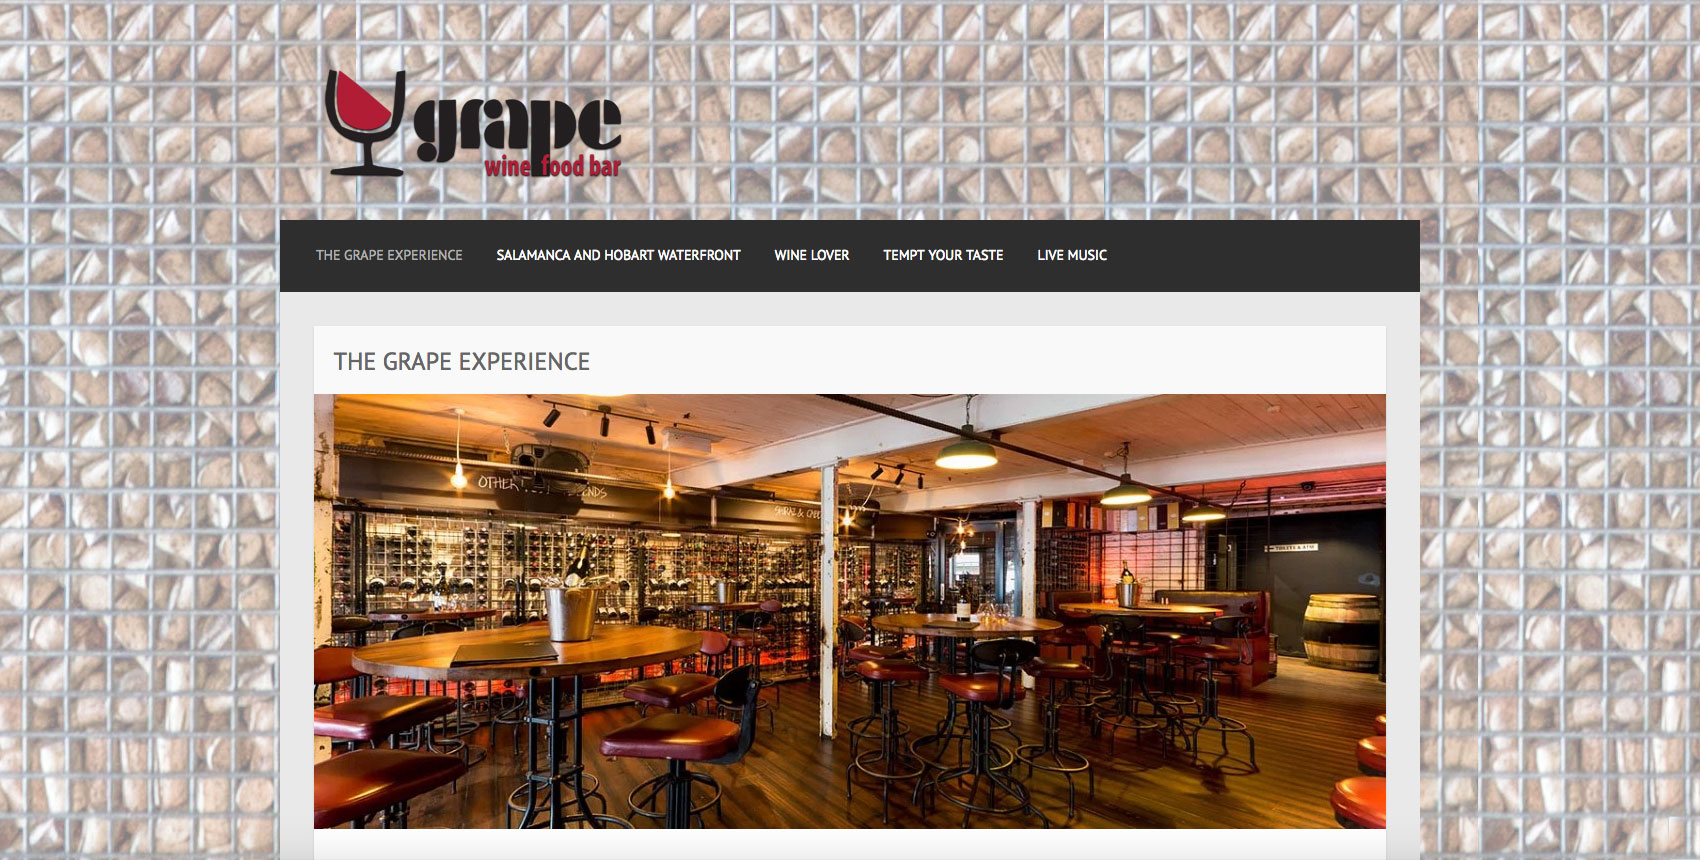 The Grape Wine and Food Bar